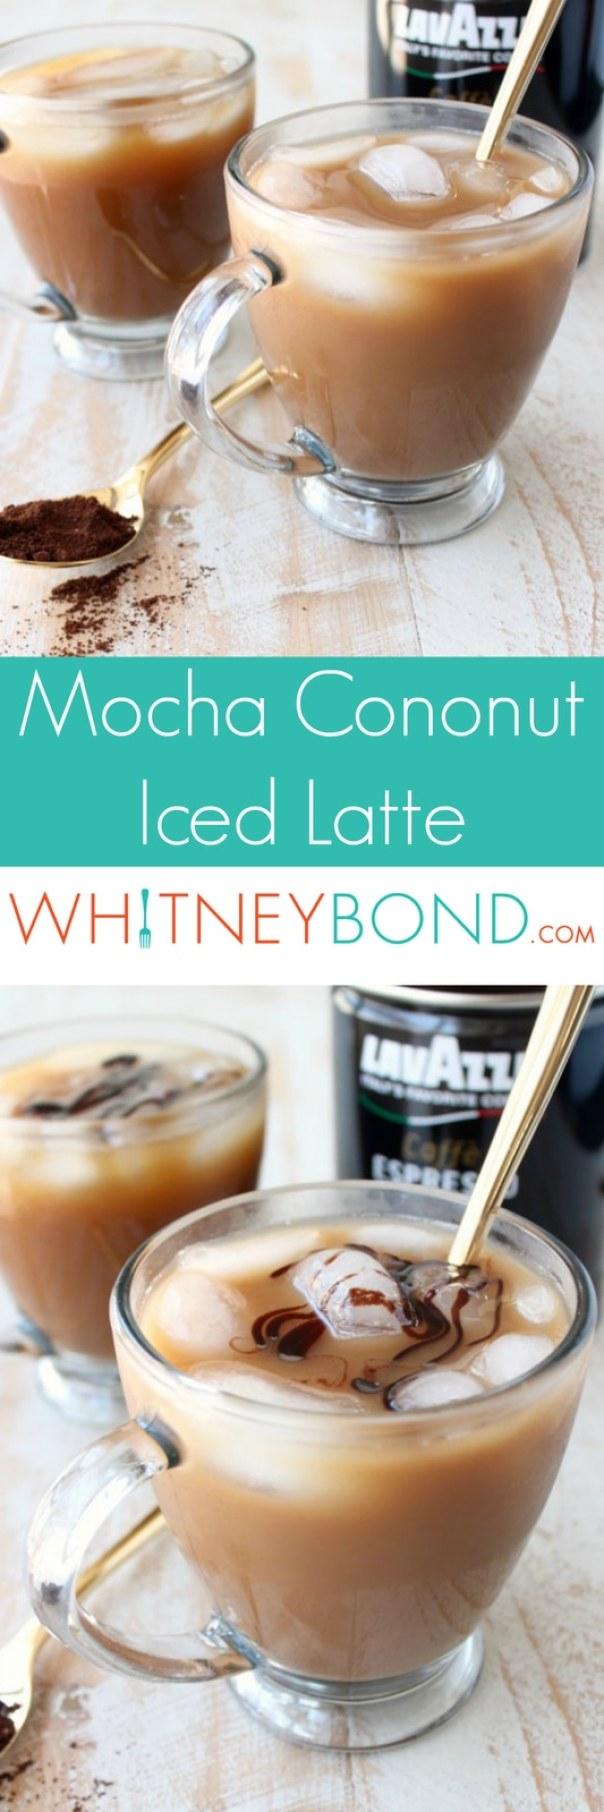 Mocha Coconut Iced Latte Recipe